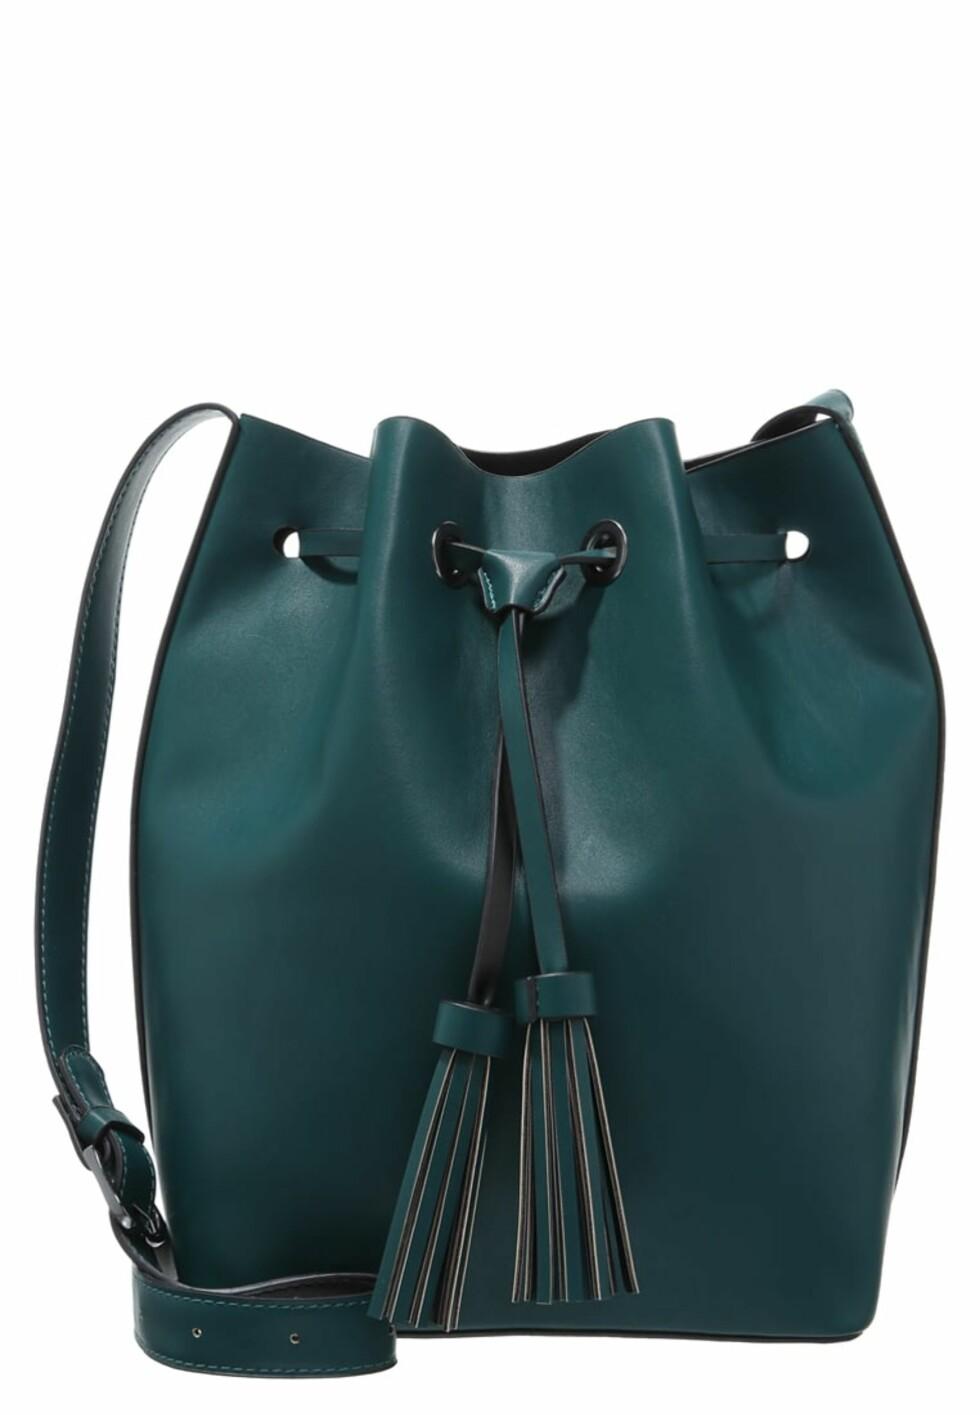 Bucketbag fra Even&Odd via Zalando.no | kr 249 |  pn.zalando.net/go.cgi?pid=1173&wmid=cc&cpid=12&target=http://www.zalando.no/even-odd-handveske-green-black-ev451ha4f-m11.html